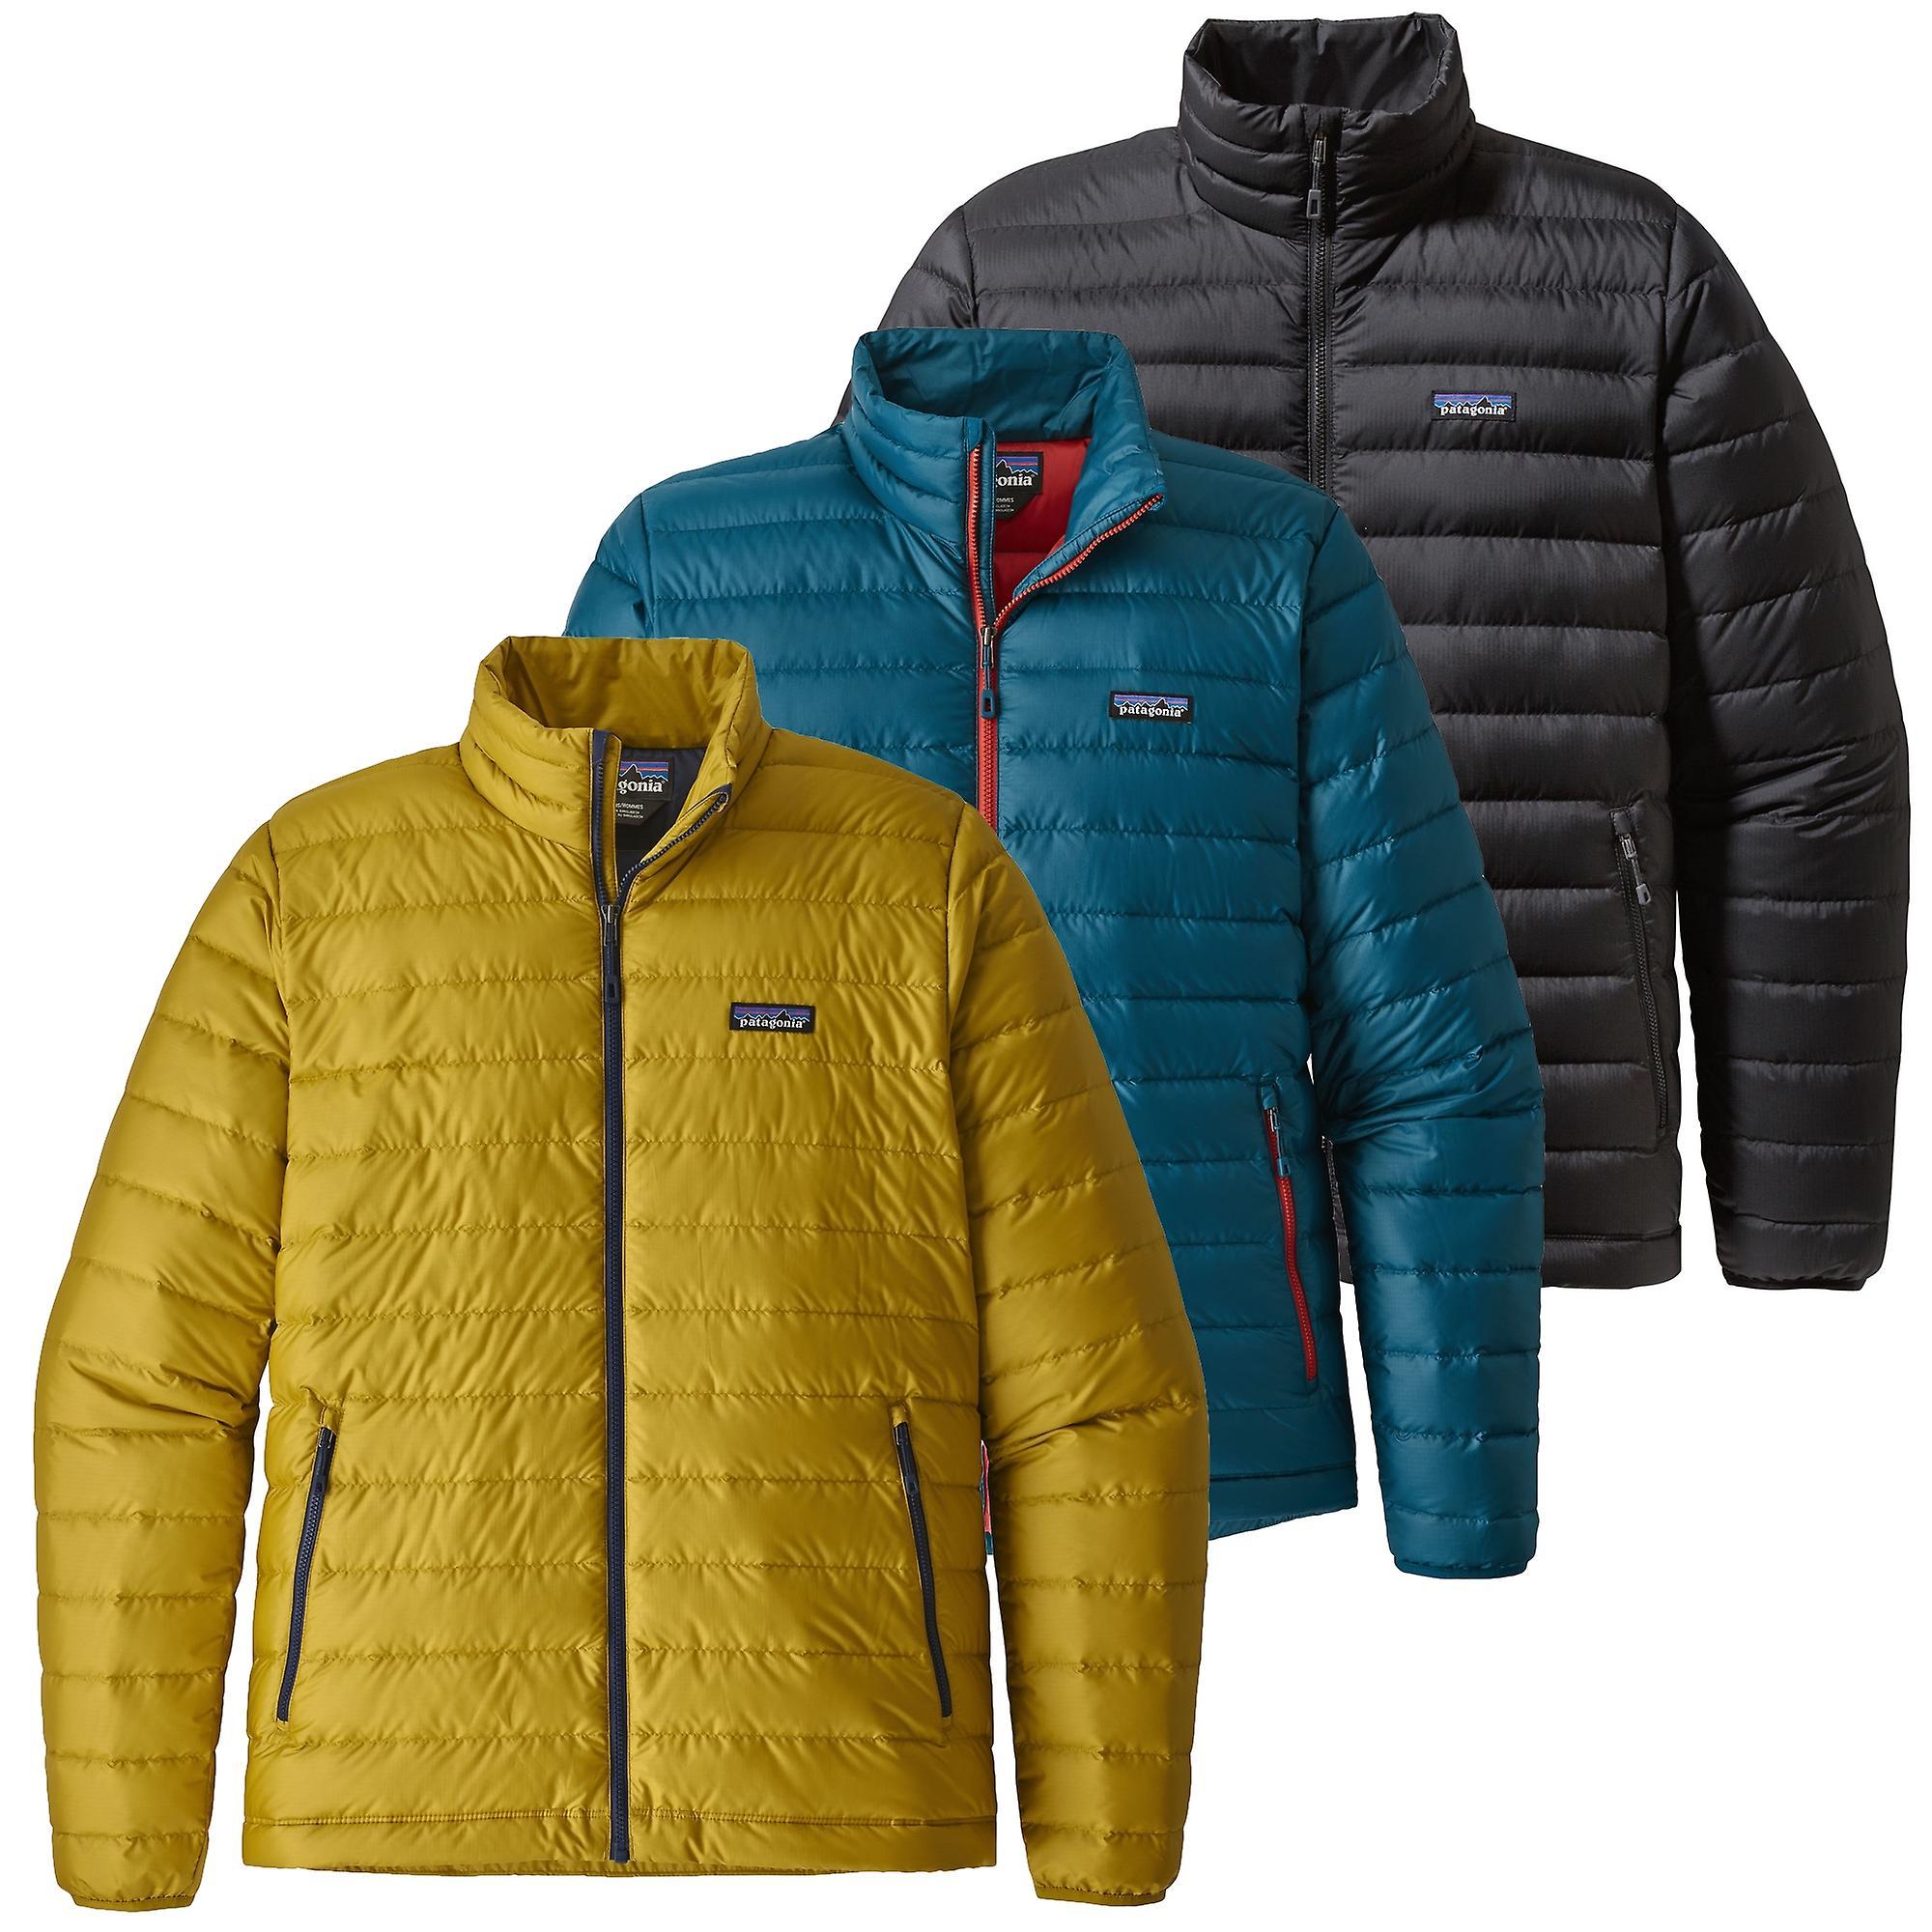 new products a561e 43c23 Patagonia Herren Daunenjacke Down Sweater